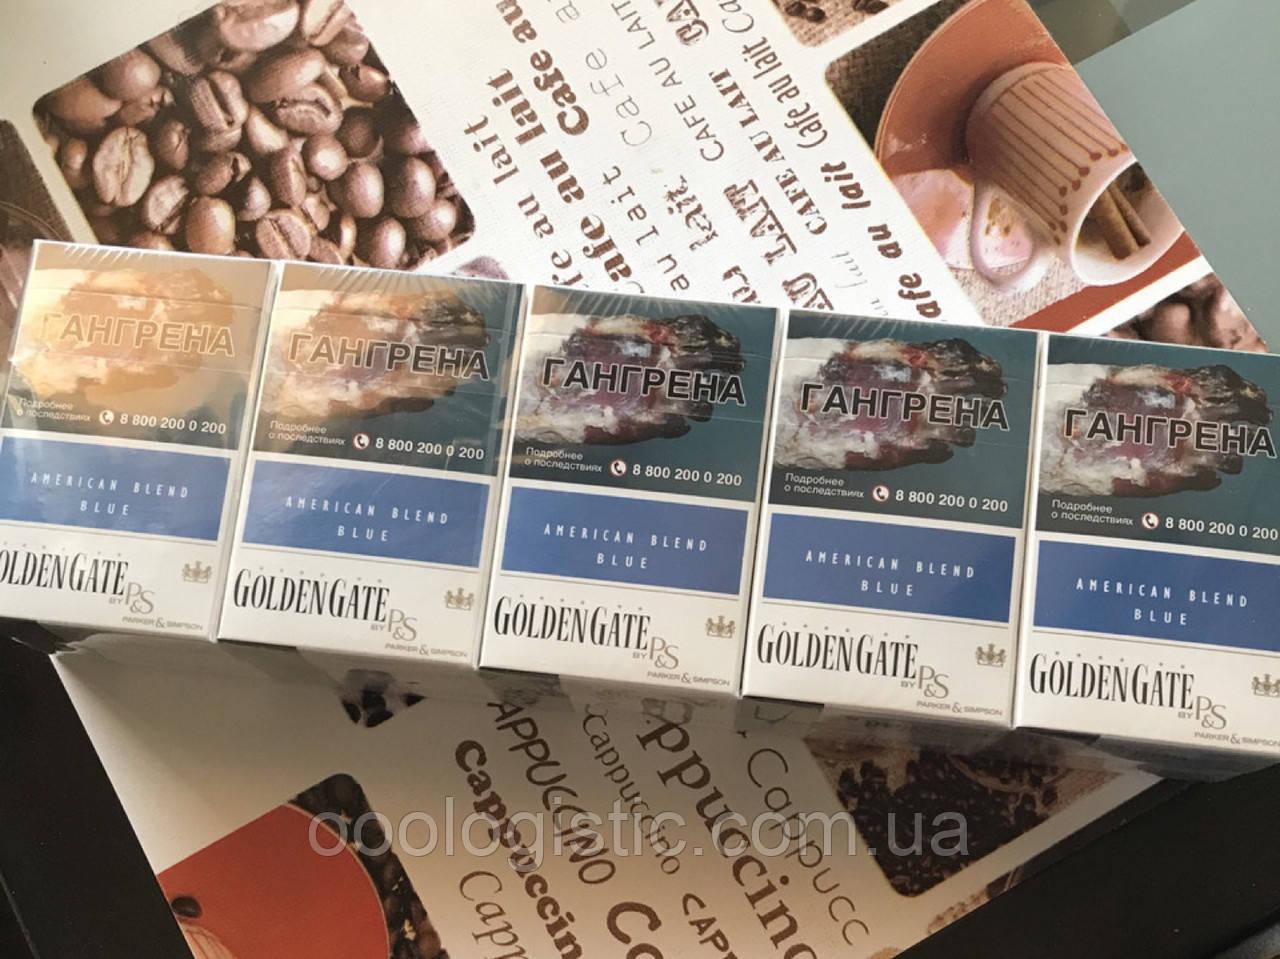 Сигареты Golden Gate Blue блок 10 пачек duty free Германия